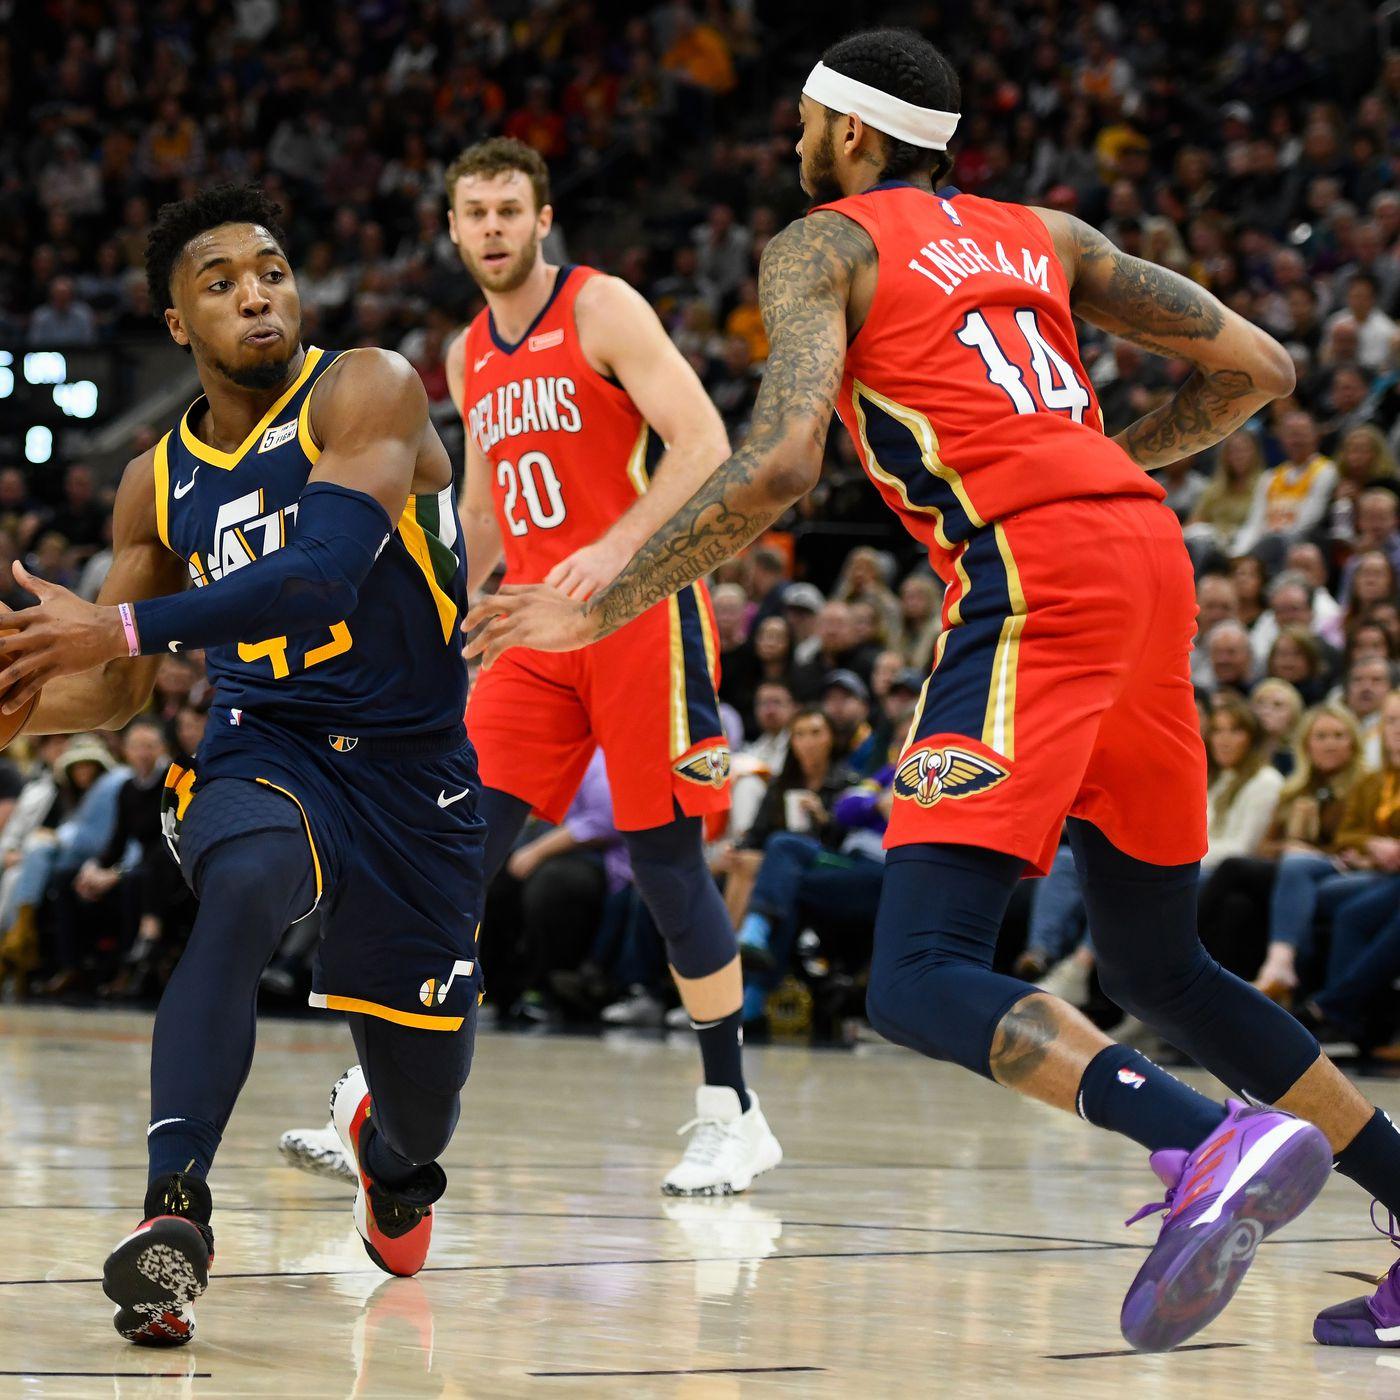 Utah Jazz Win Streak Snapped With Crazy Ot Loss To New